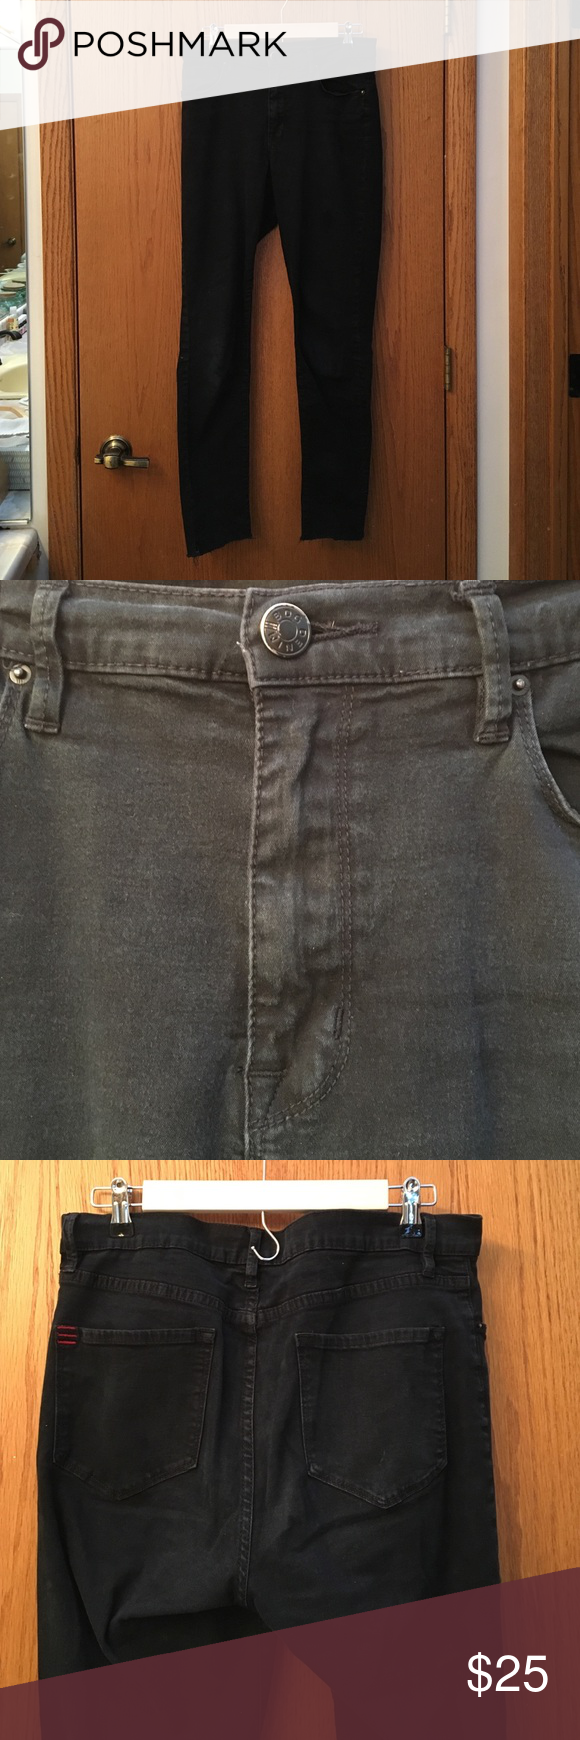 UO BDG Black Twig Highrise Jeans Urban Outfitter BDG Black highrise skinny jeans 30W BDG Jeans Skinny